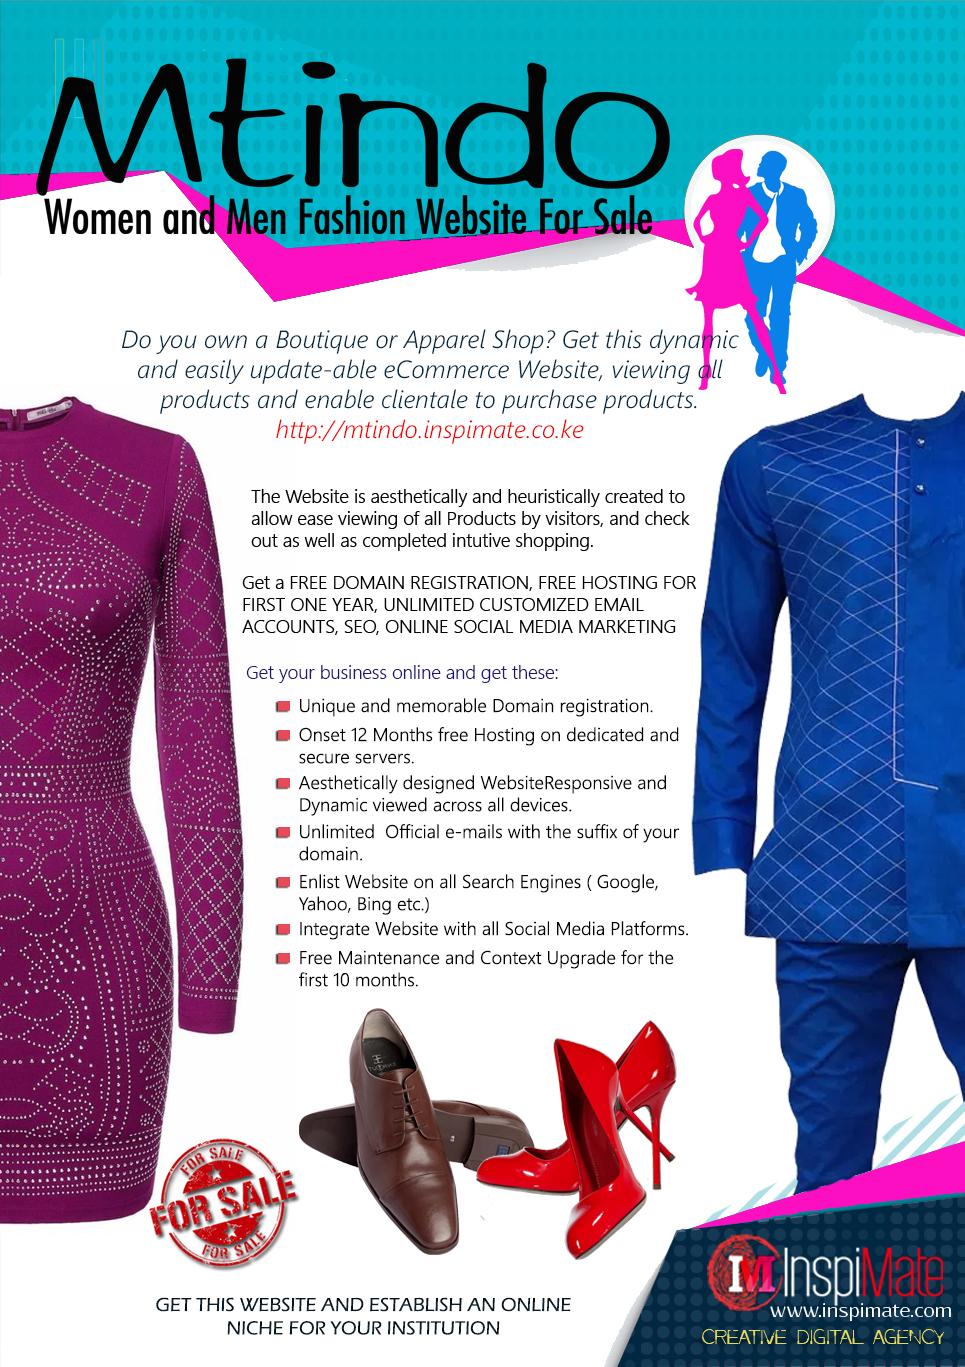 Mtindo, Women, Men Fashion, Trends Online Shop Website for sale by Inspimate